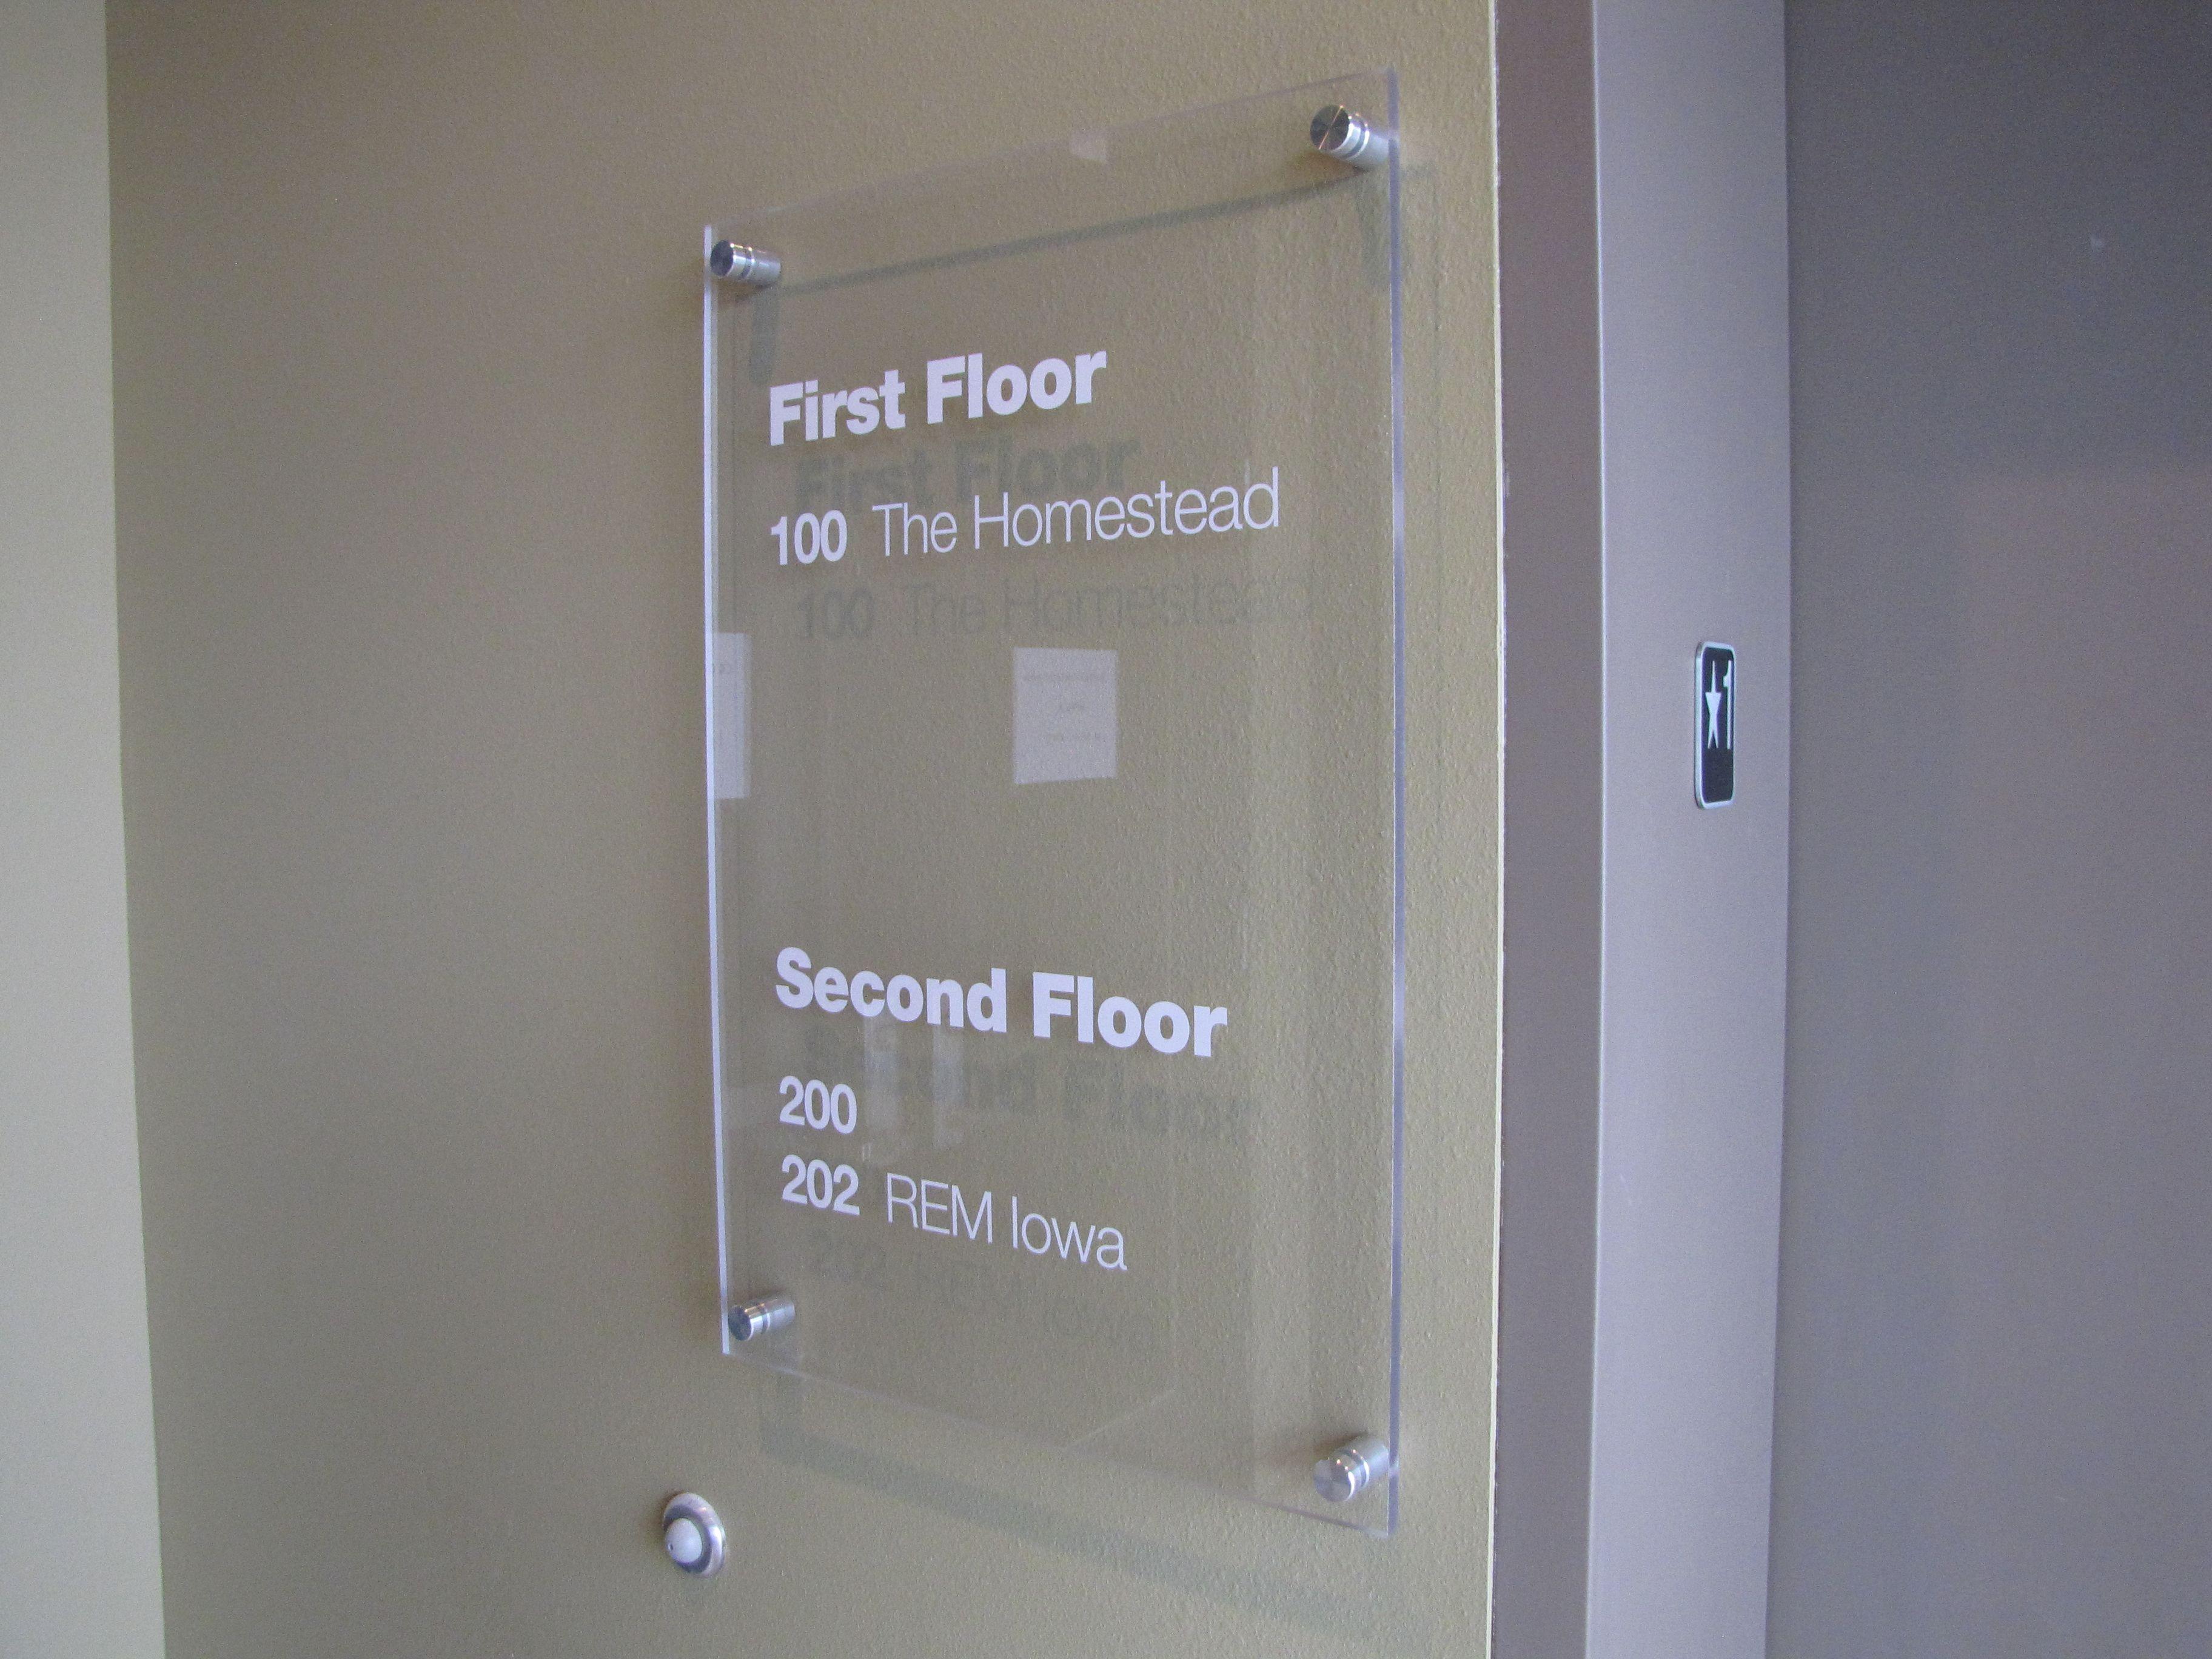 Glass Directory Wayfinding Elevator Sign Signage Design Wayfinding Wayfinding Signage